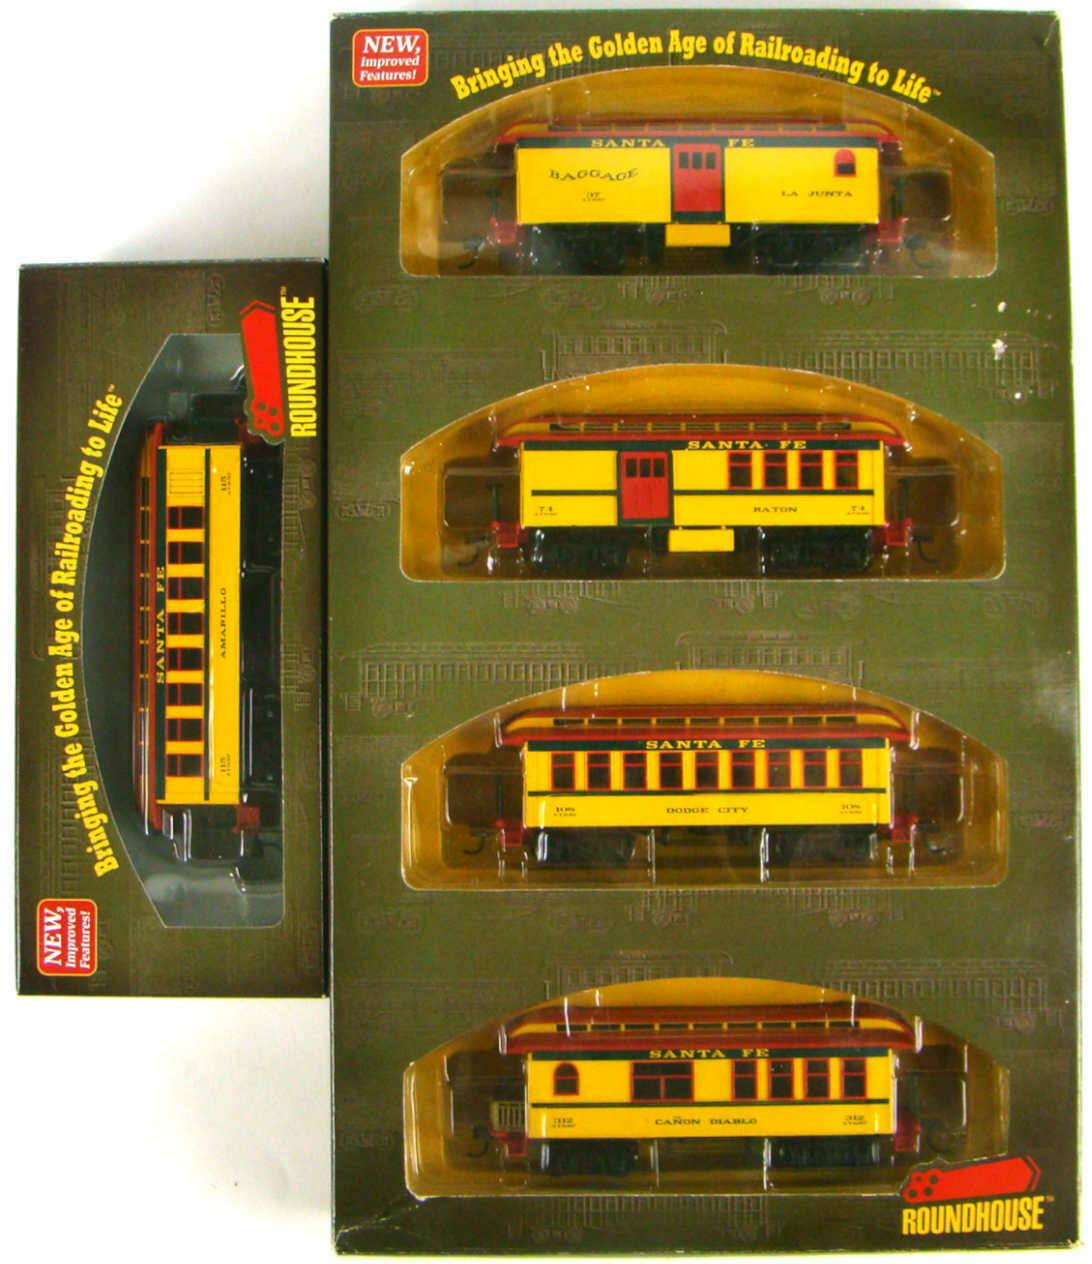 Athearn/Roundhouse 84301/84281 Santa Fe Complete 5-Coach 34' Overton Set HO Scale